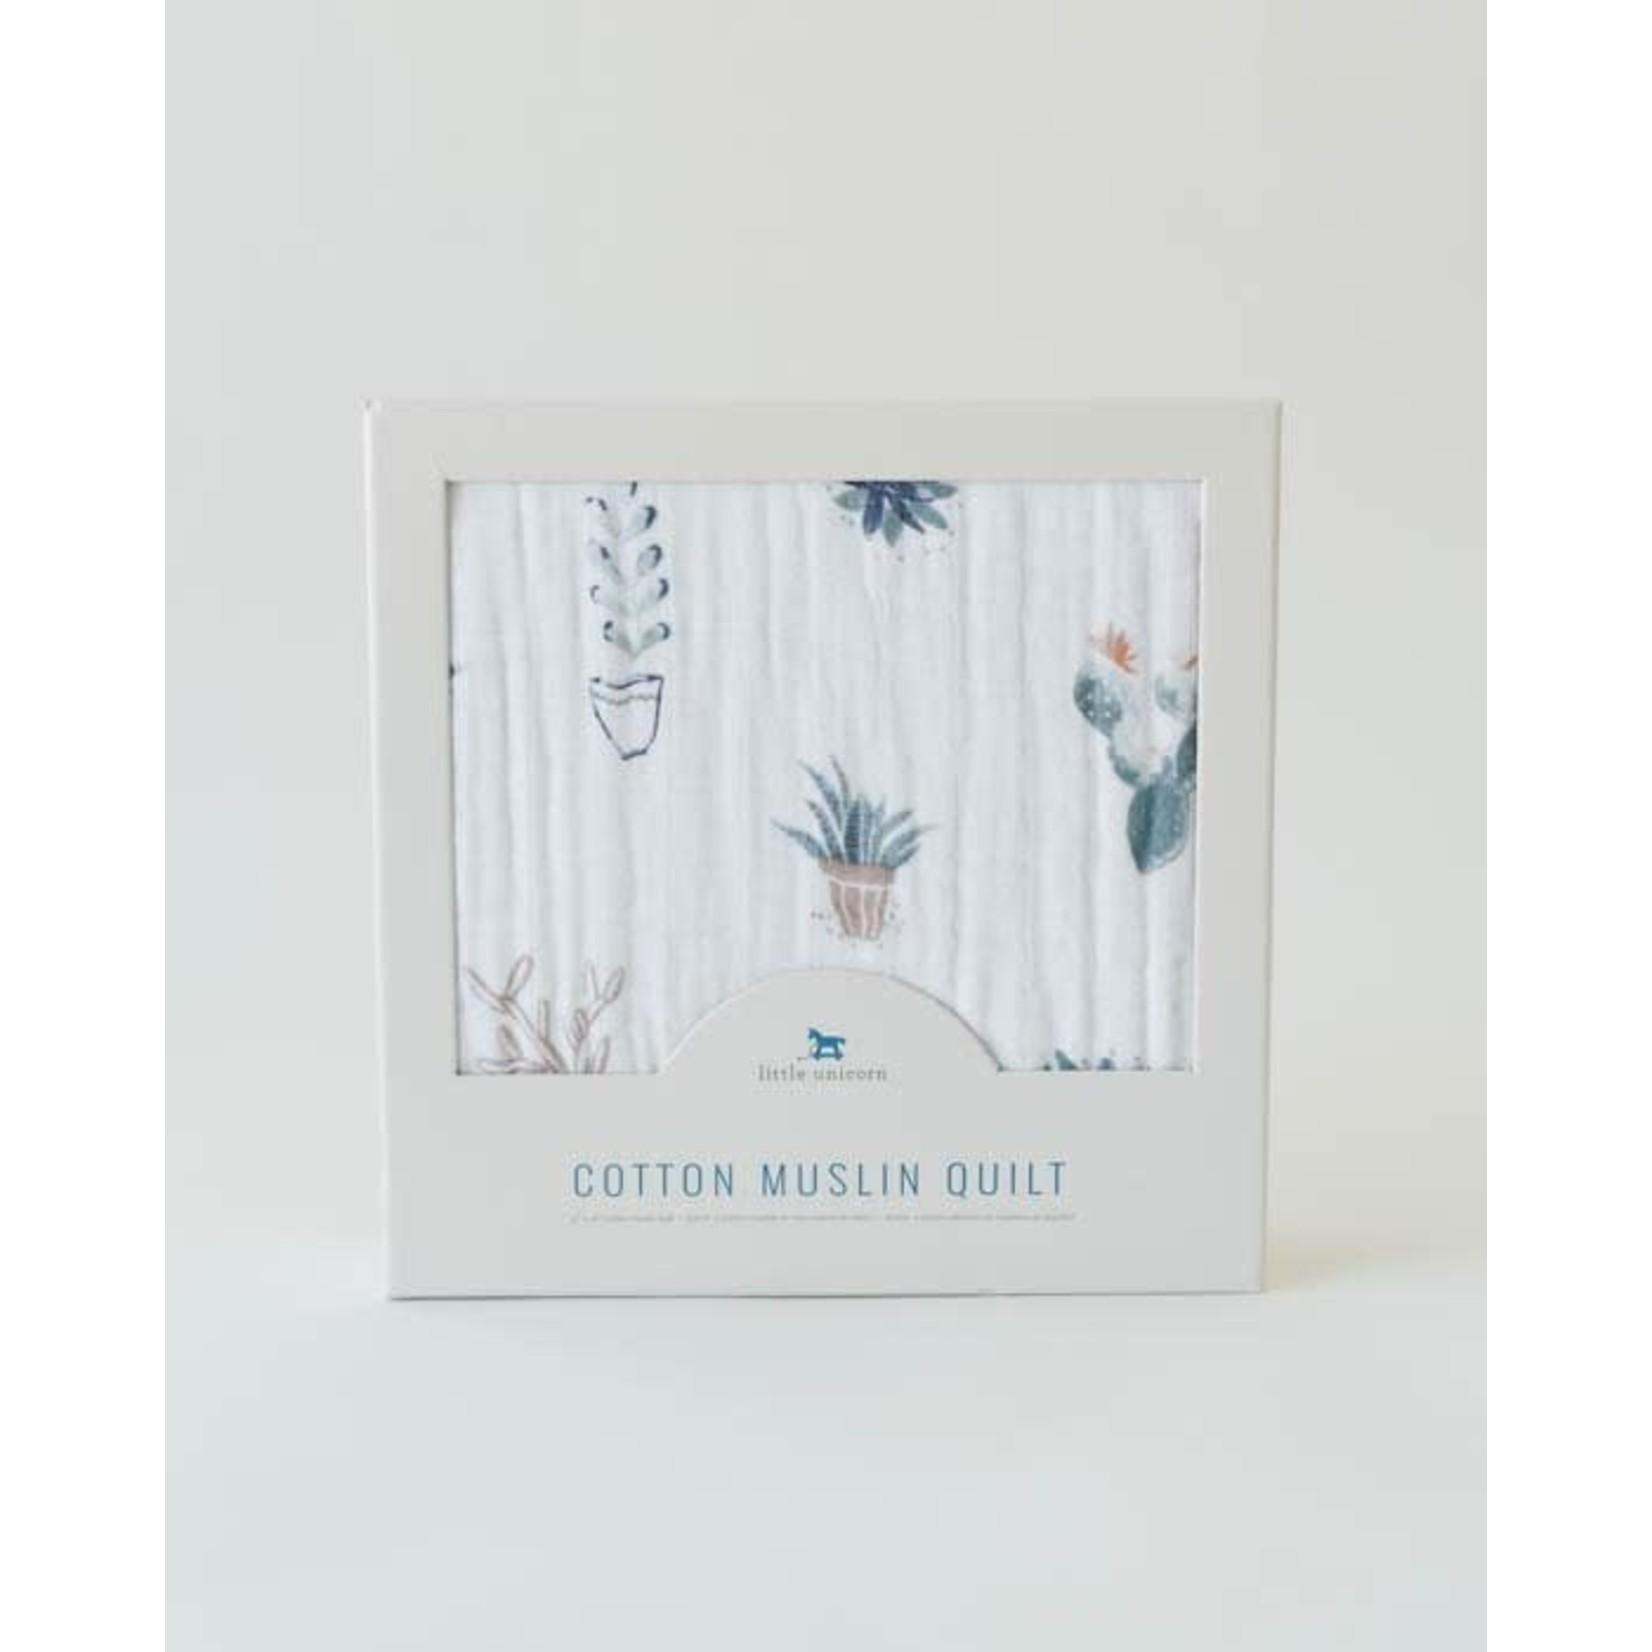 Little unicorn Courtepointe - cactus I